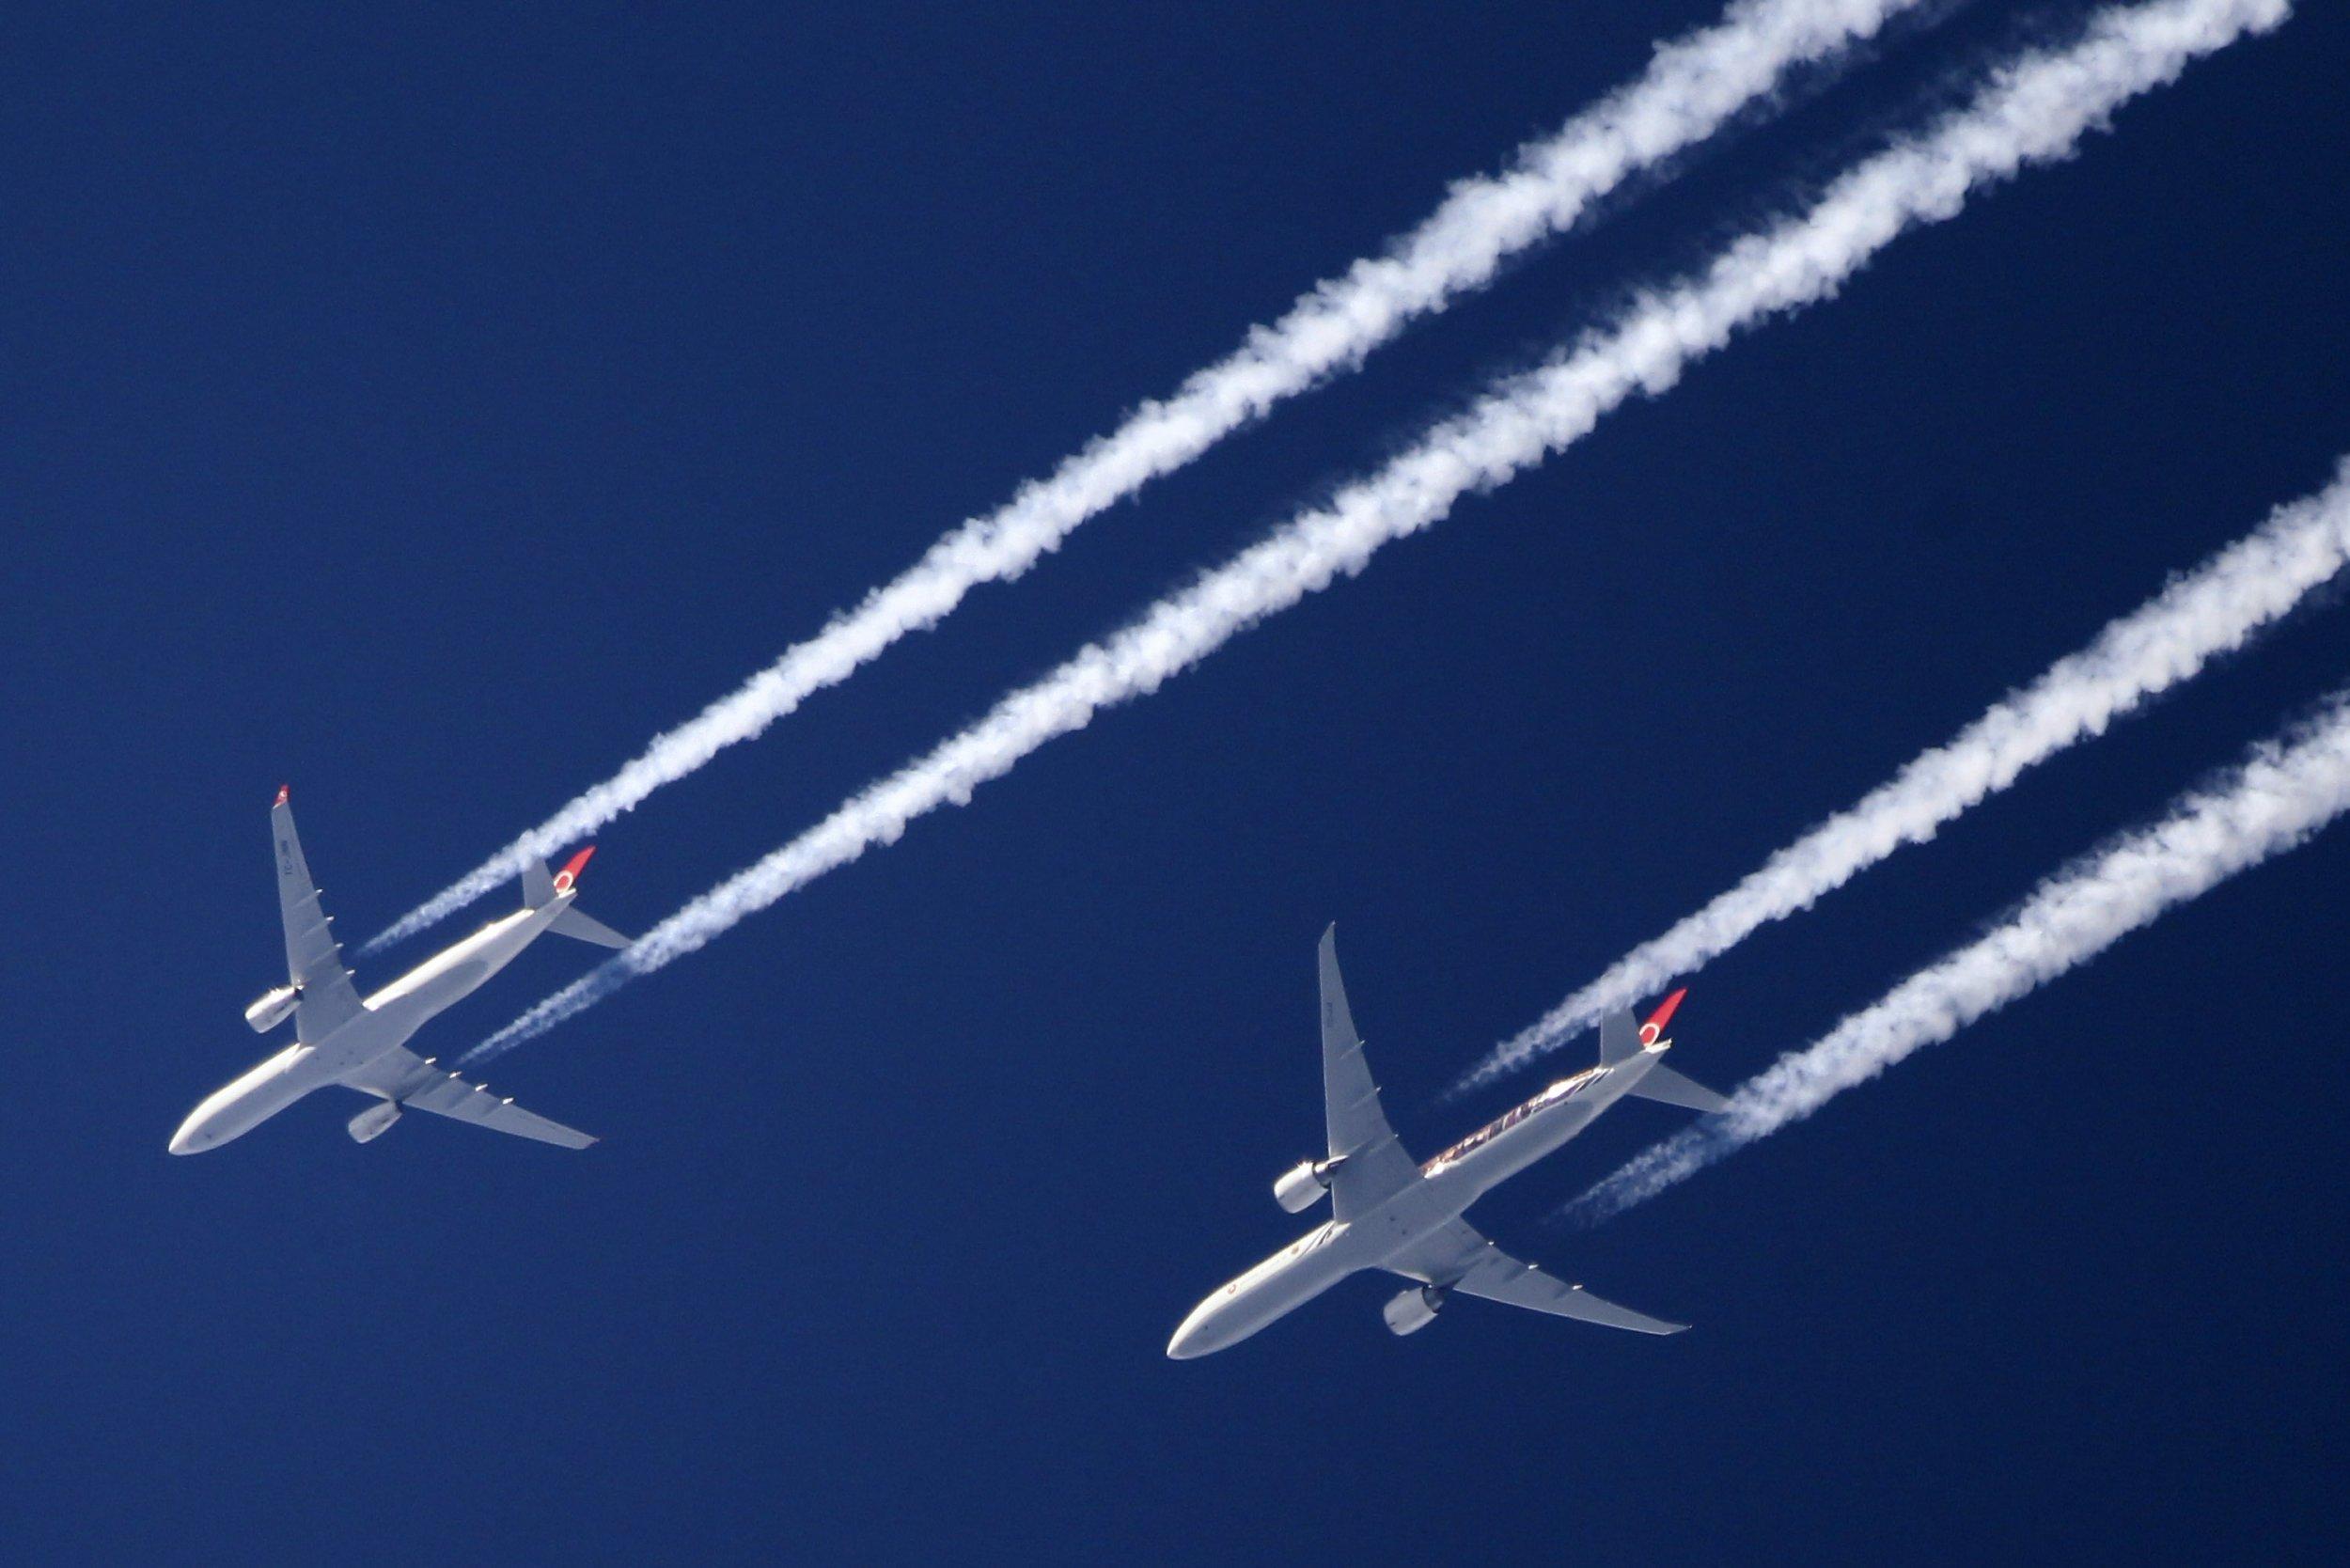 Faa Audio Perplexed Pilots Report Ufo Sighting Above New